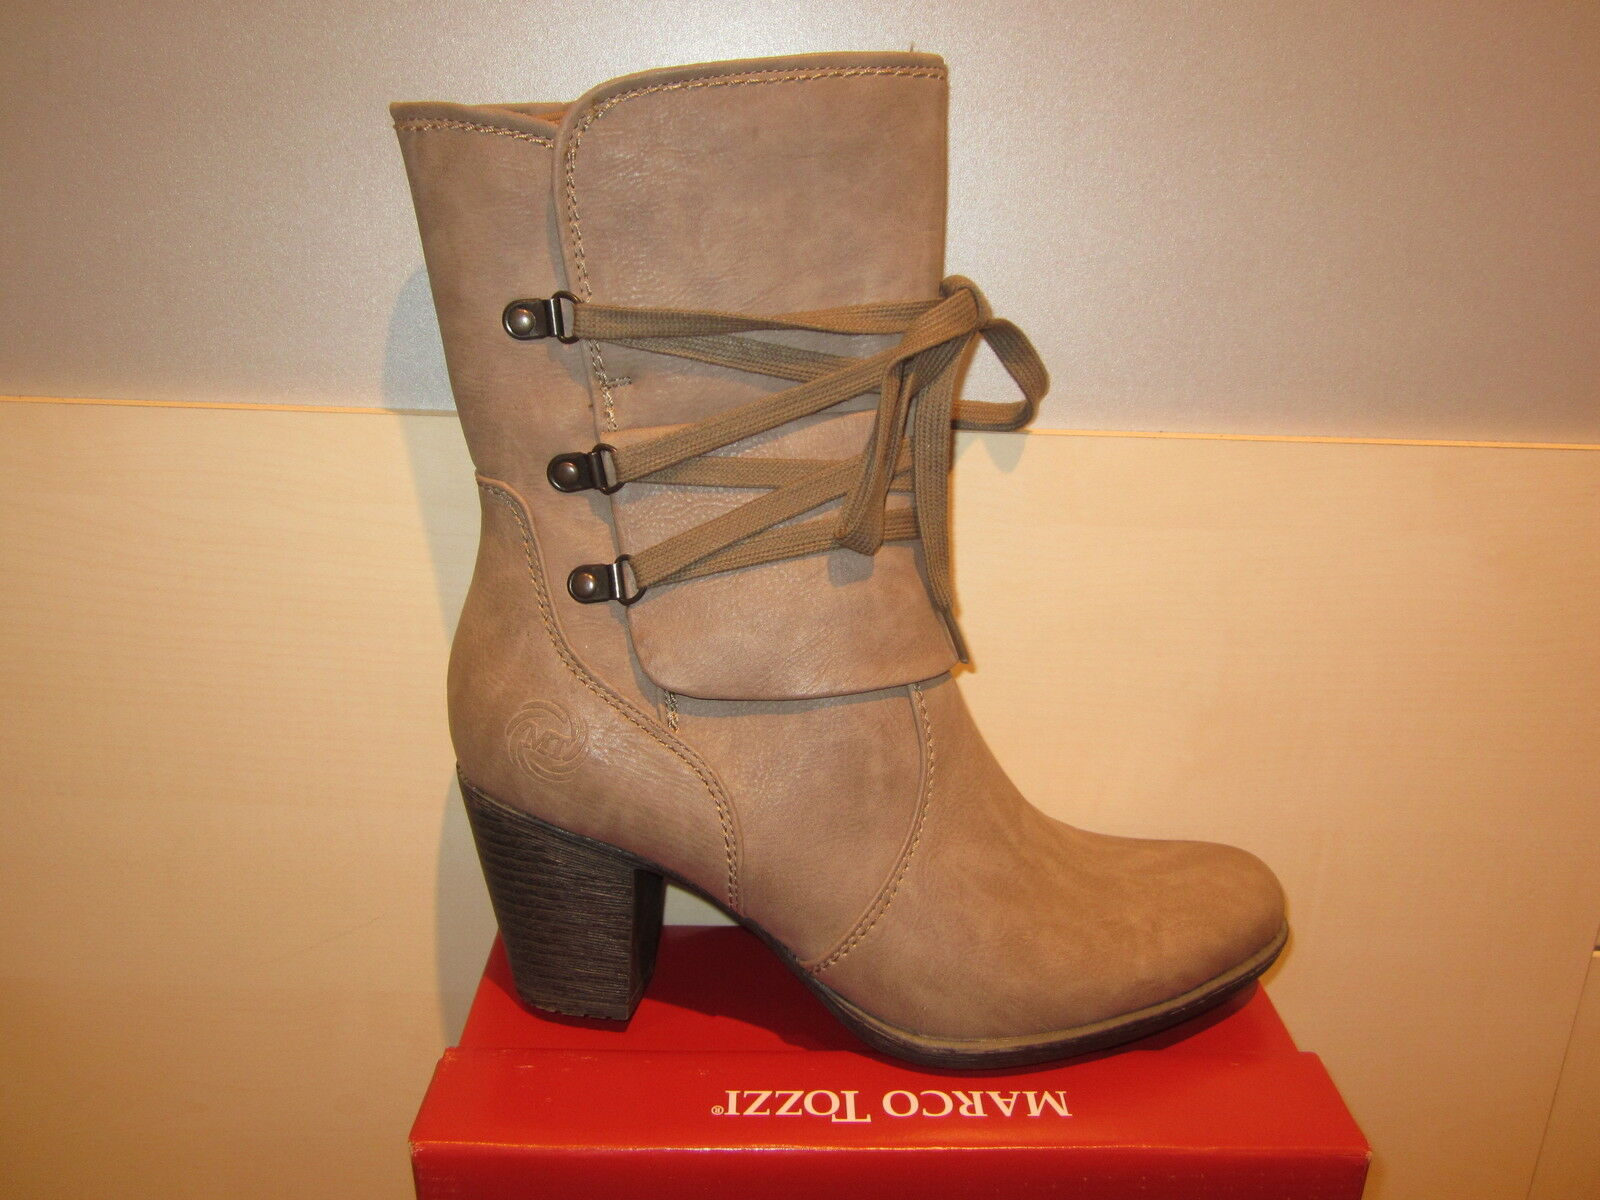 MARCO TOZZI TOZZI TOZZI Boots, Grey   Taupe, Lightly Lined, RV NEW ef3b84